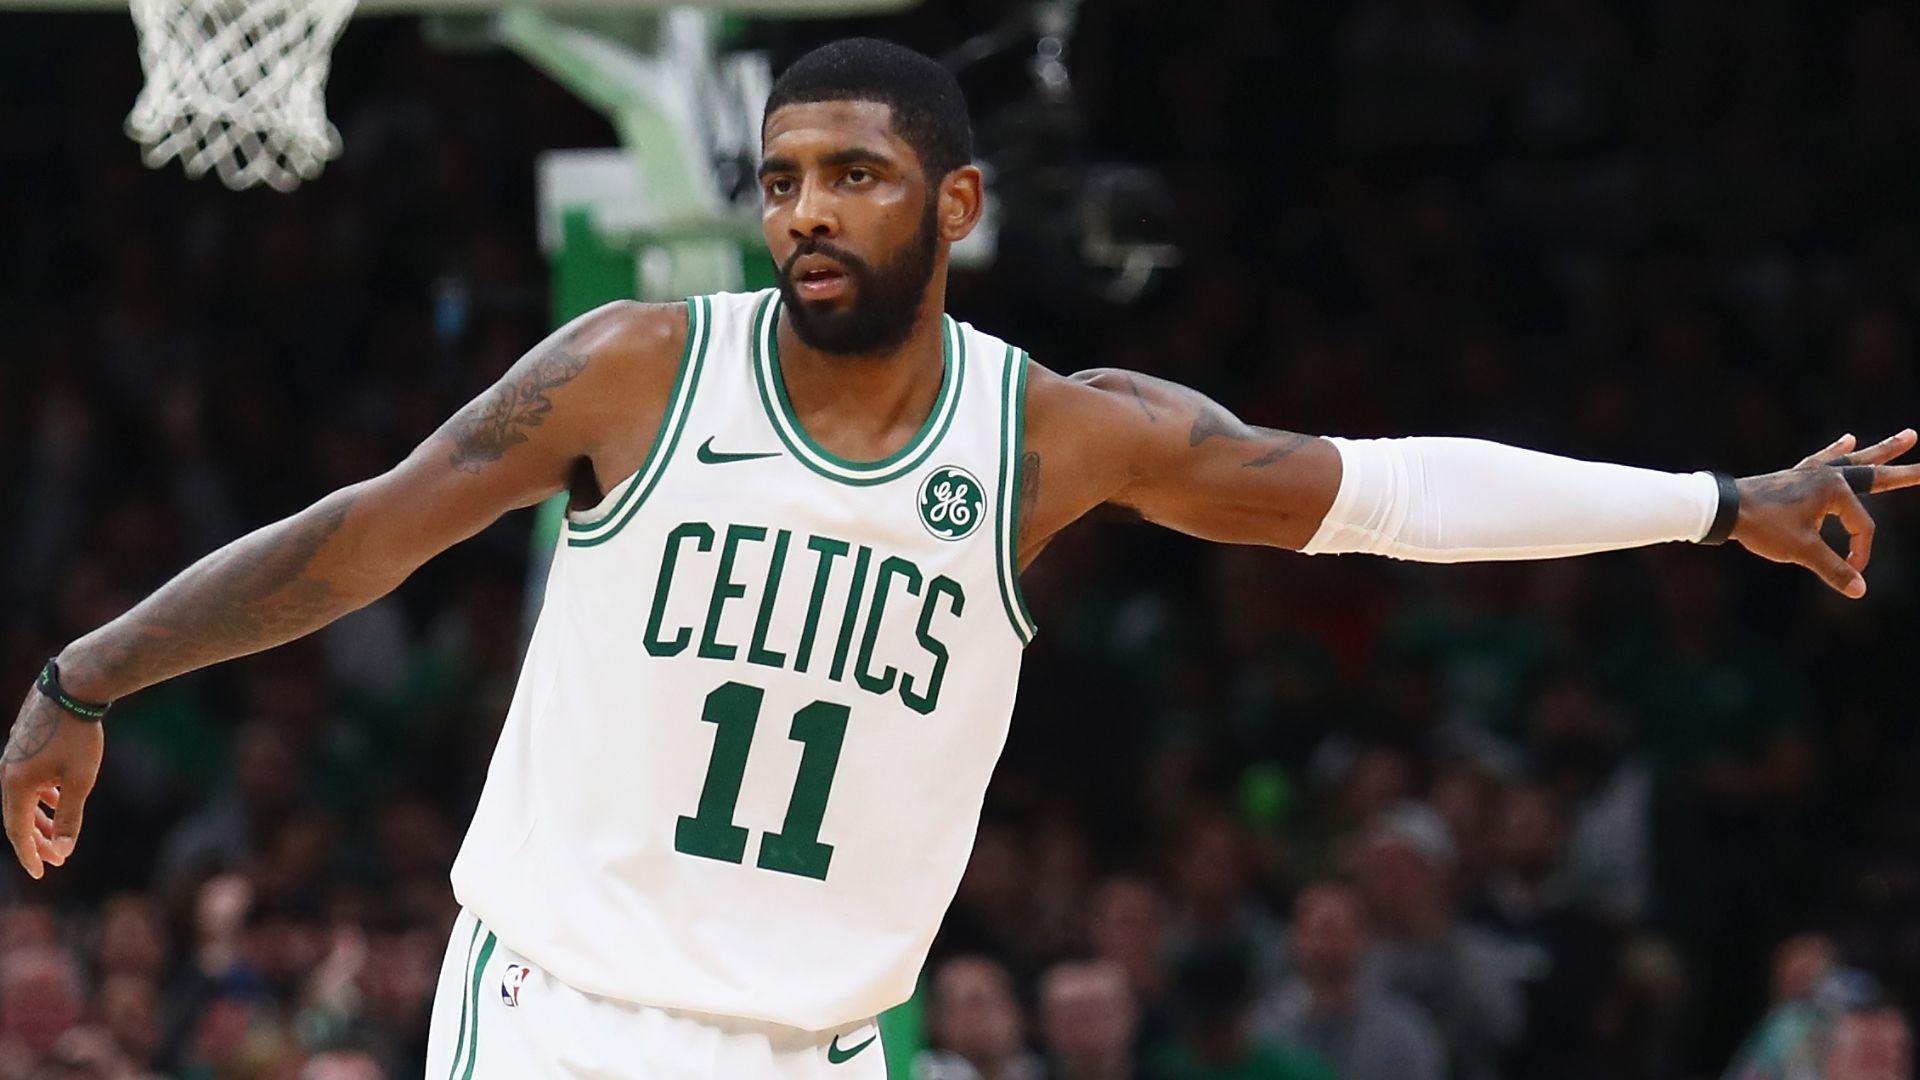 Kyrie drops 43 in OT win for Celtics